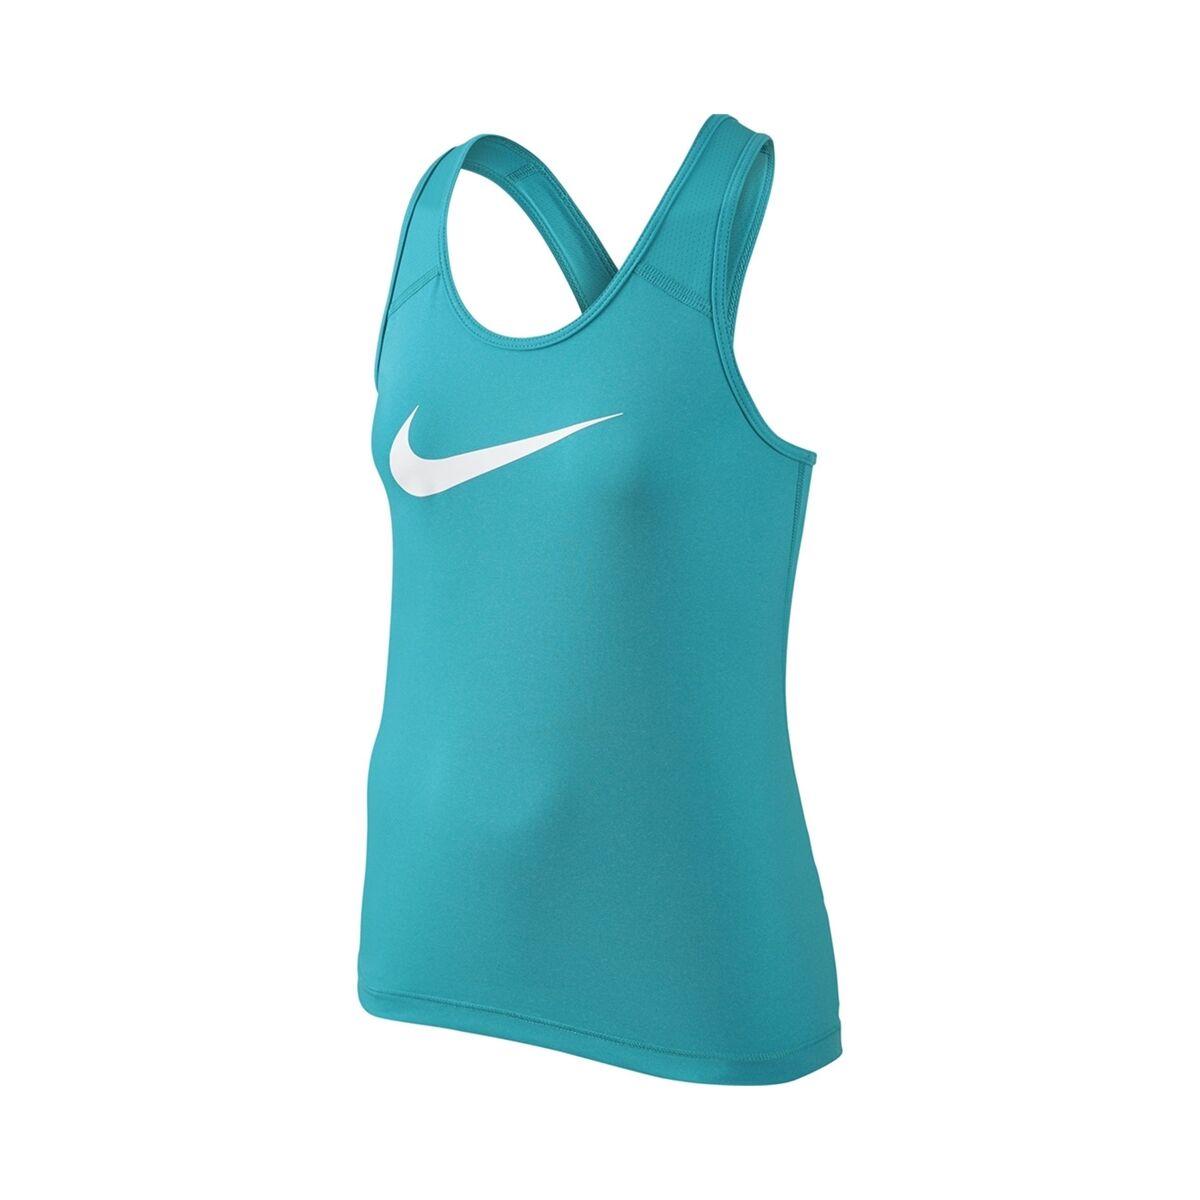 Nike Pro Cool Tank Girl Light Blue 140